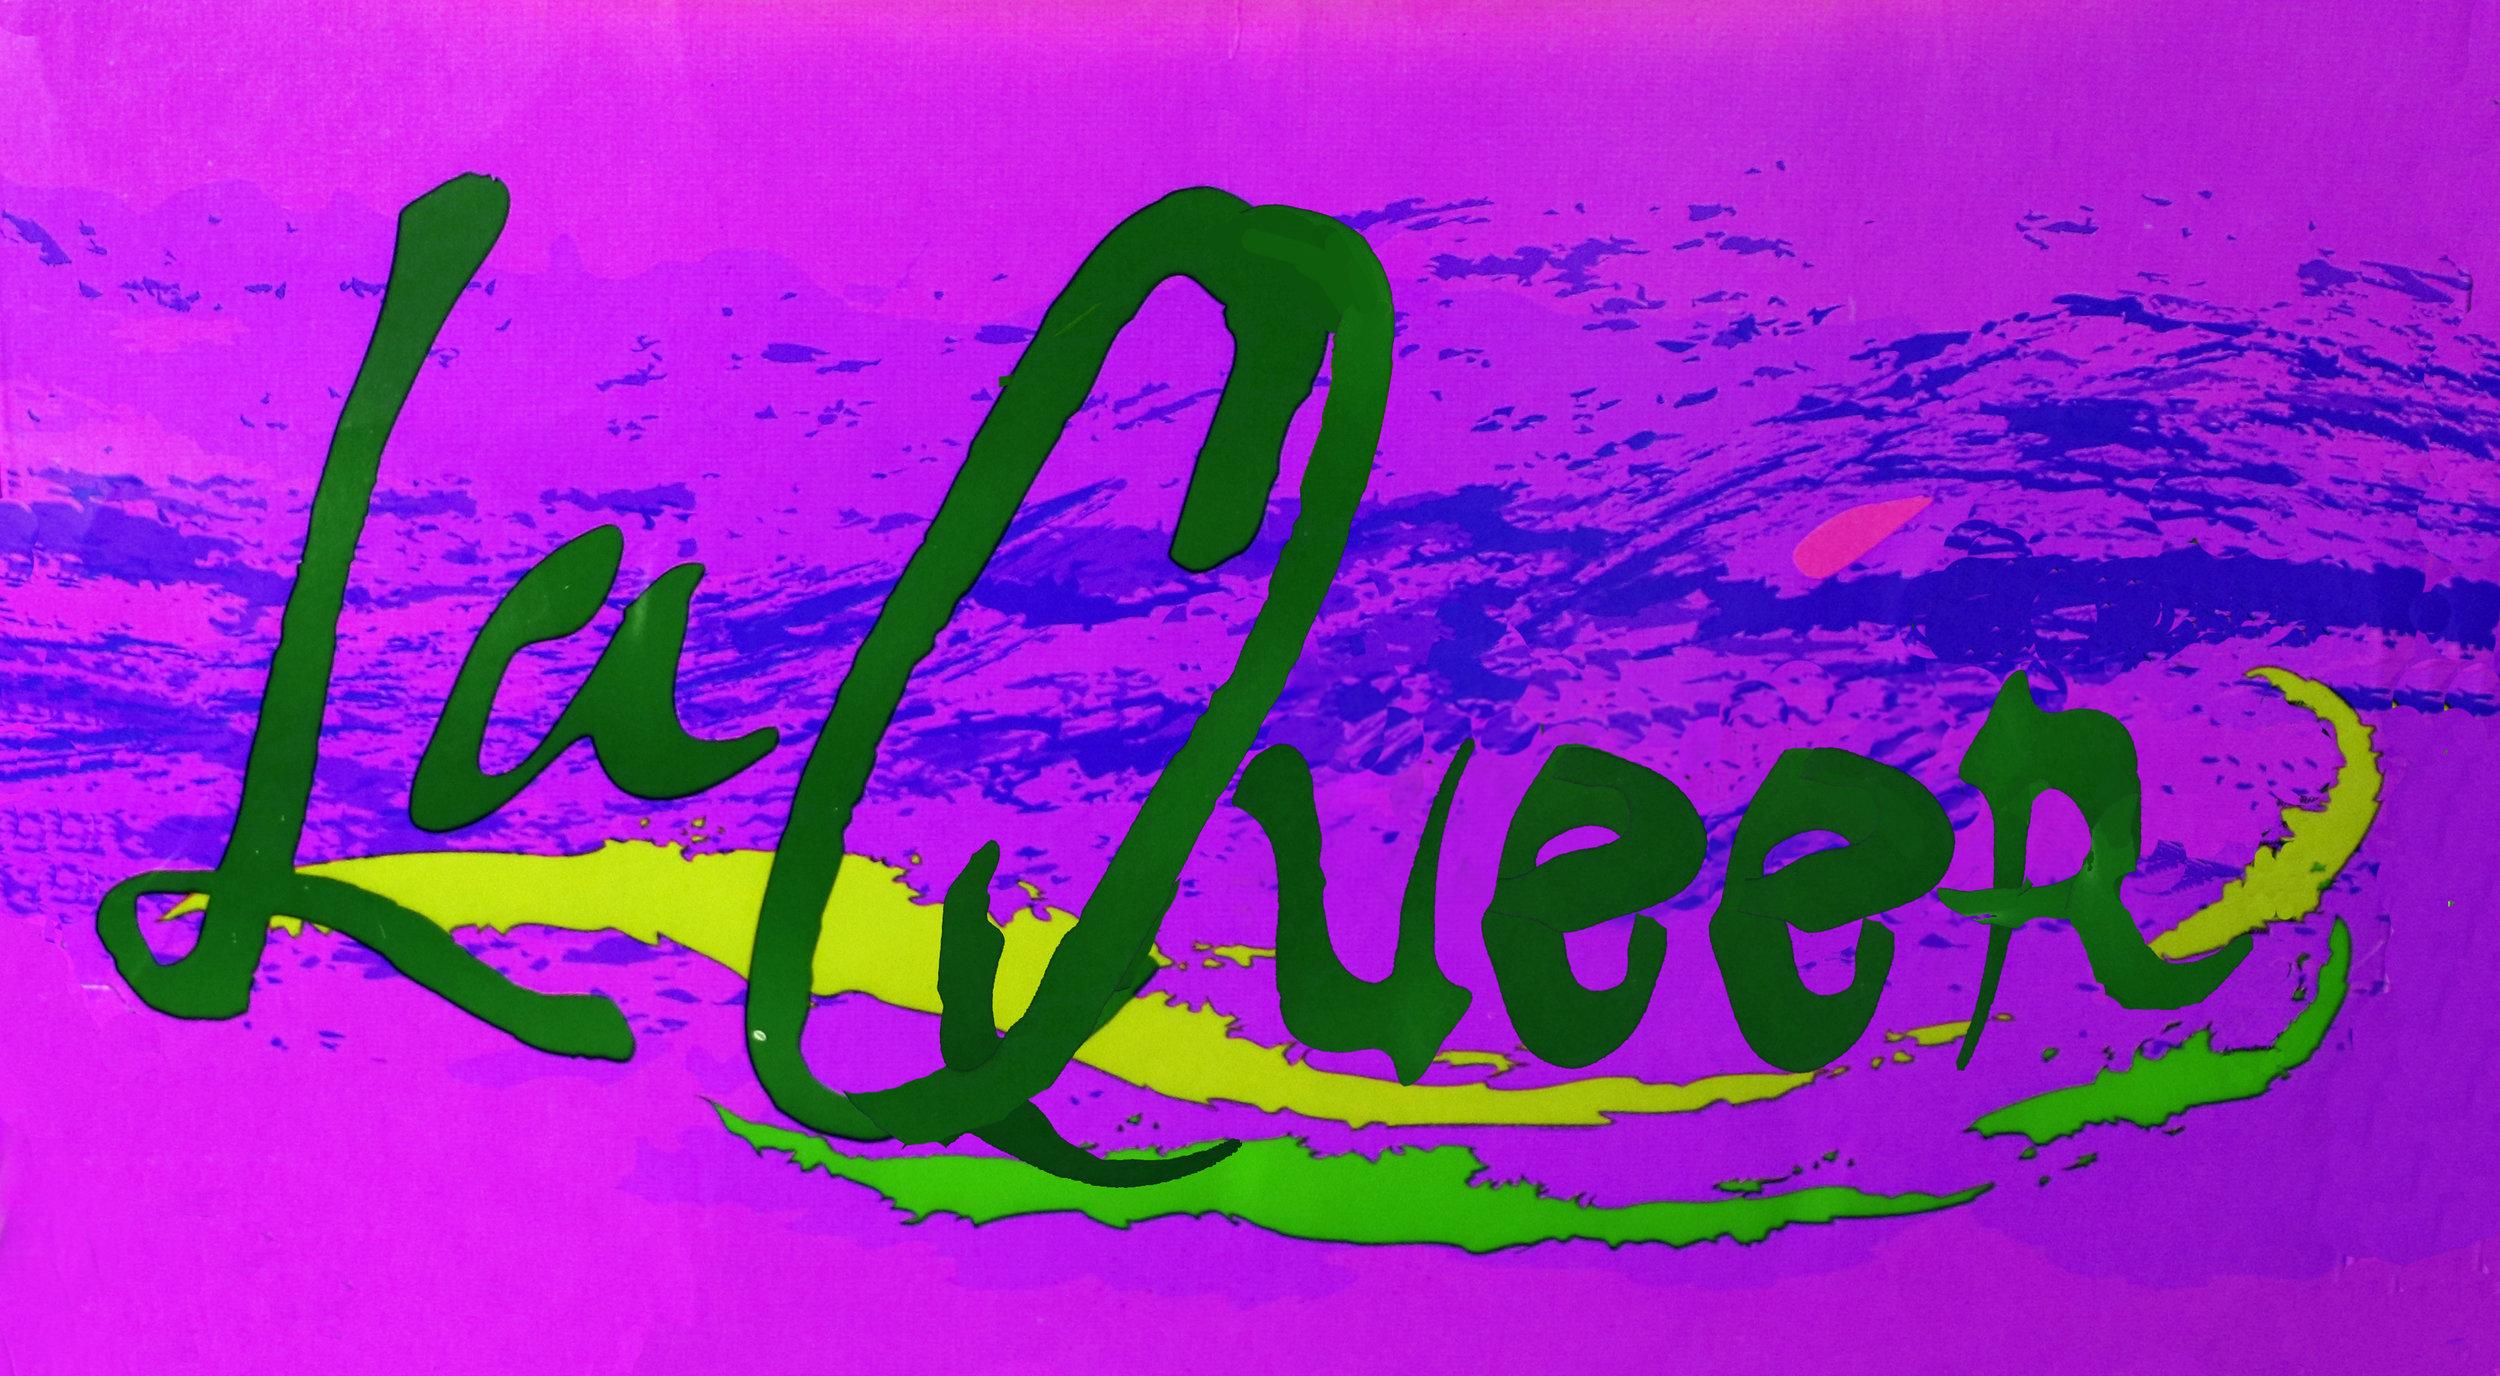 La_Queer(smalltest)_Purple copy.jpg